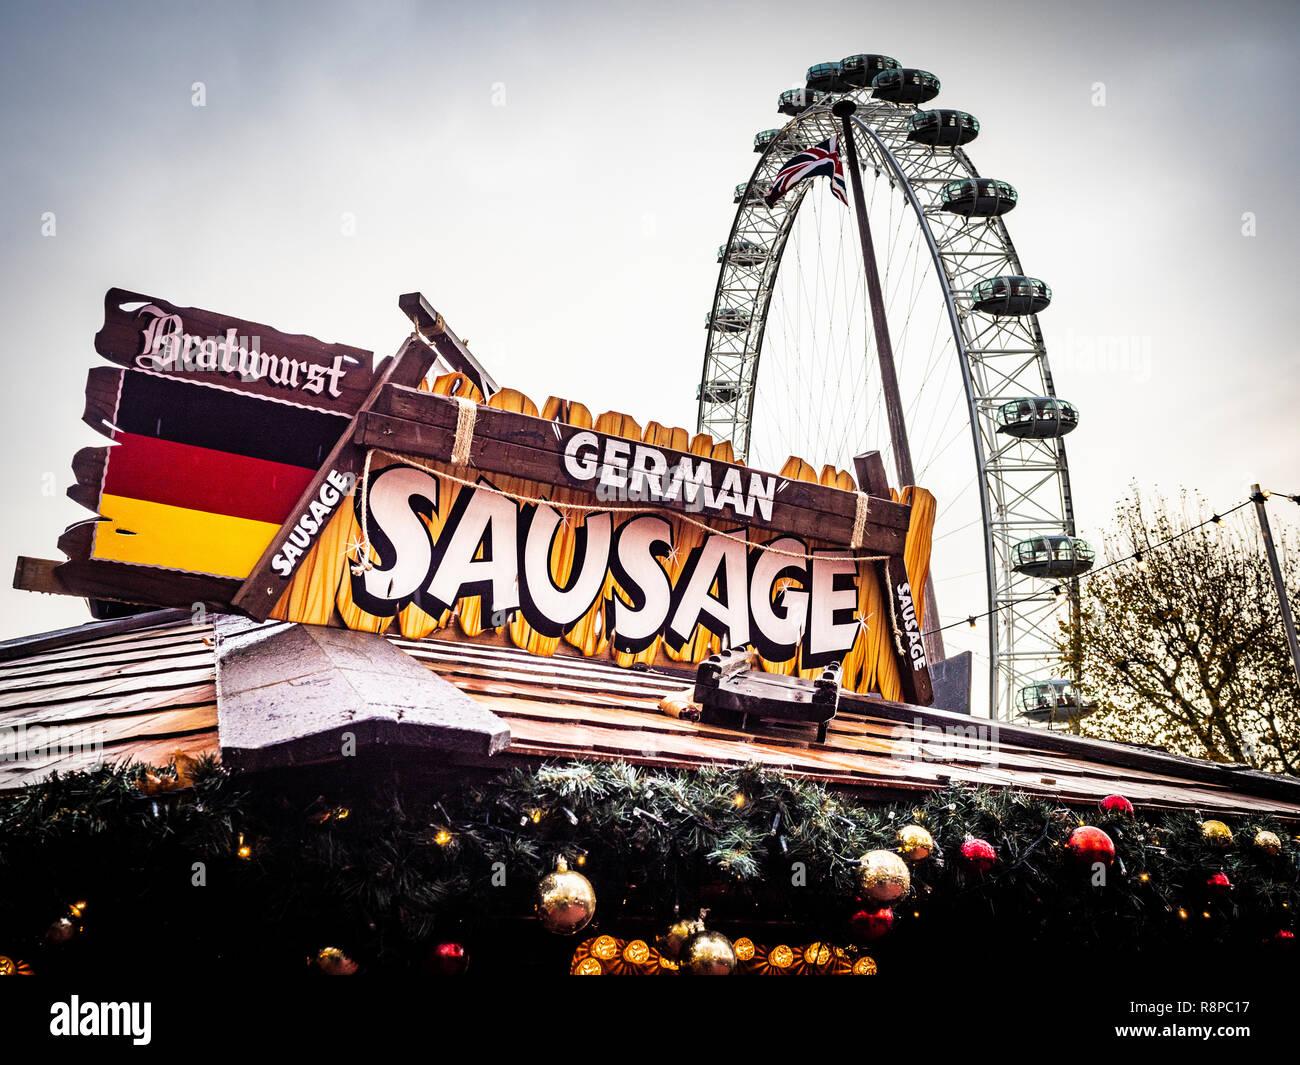 German Sausage food stall at Southbank Winter Market, London, UK. - Stock Image